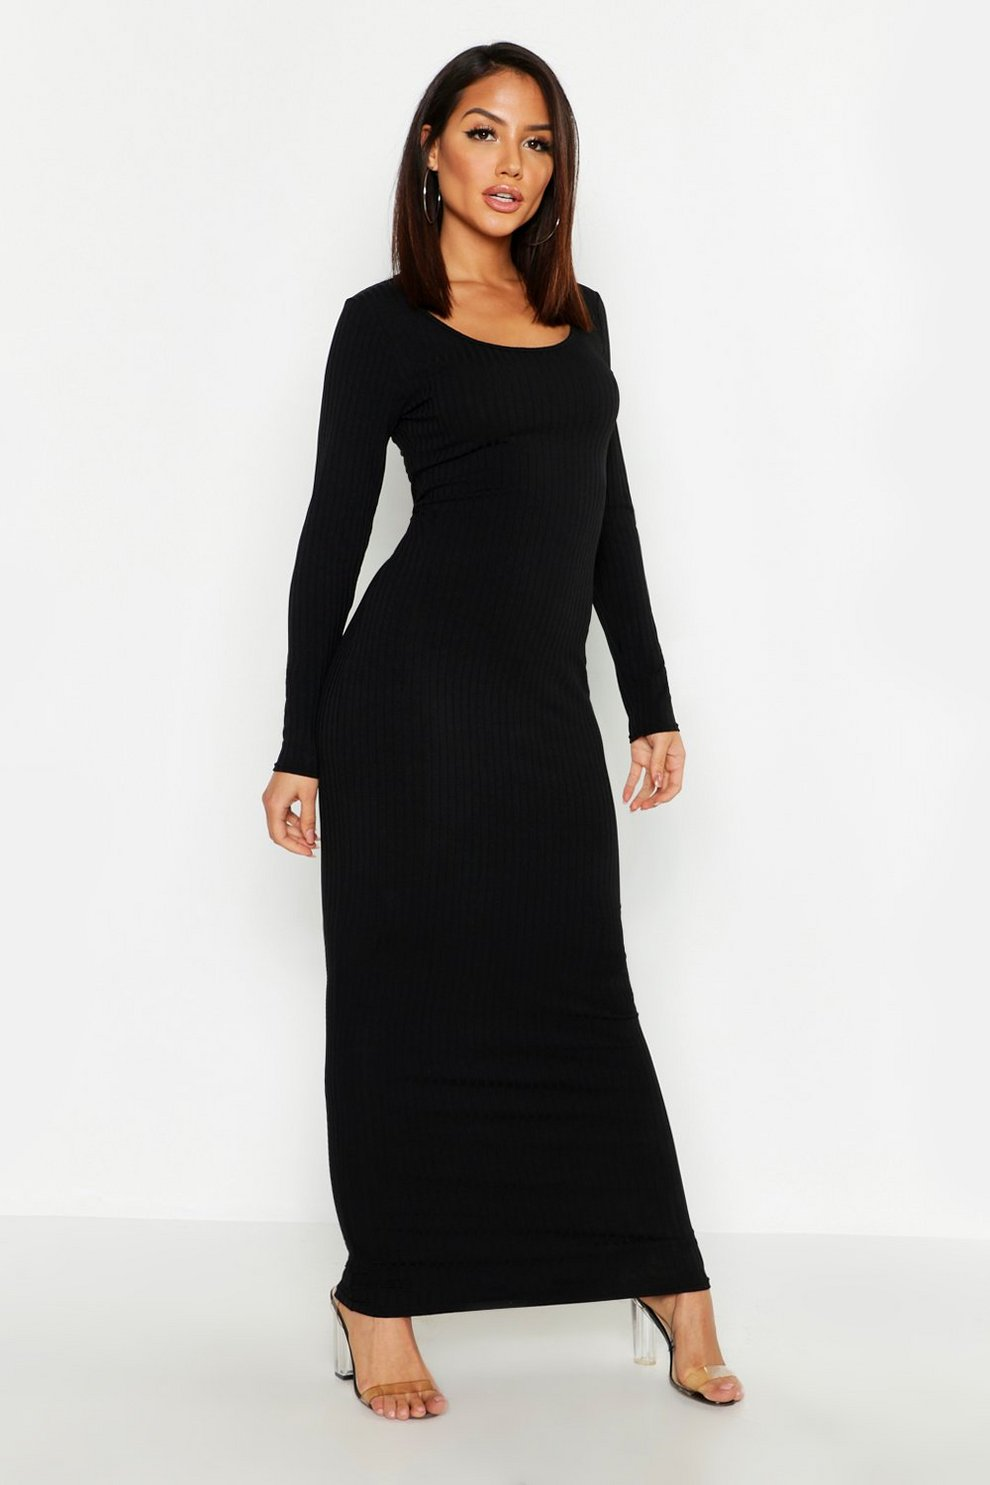 76f4ac49deff01 Long Sleeve Scoop Neck Ribbed Maxi Dress | Boohoo